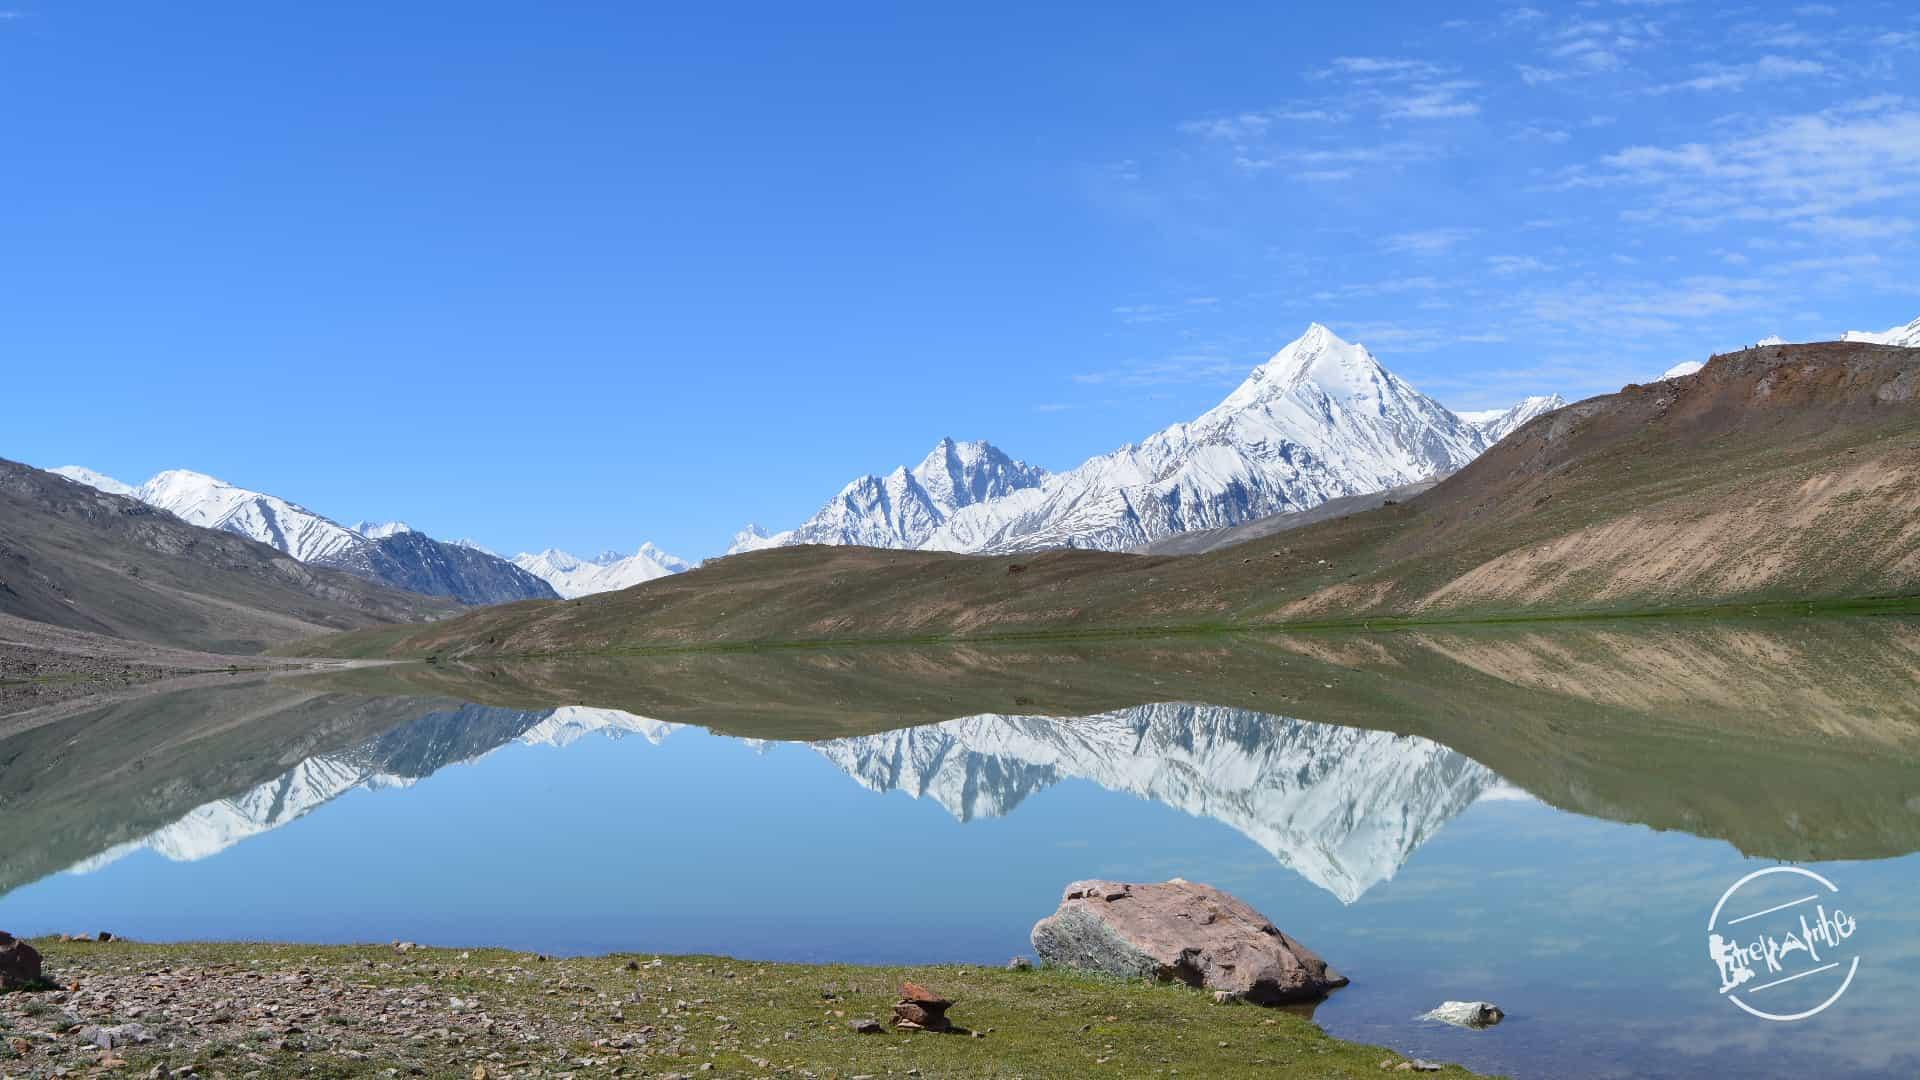 Chandratal Lake - Trekking in Himachal Pradesh